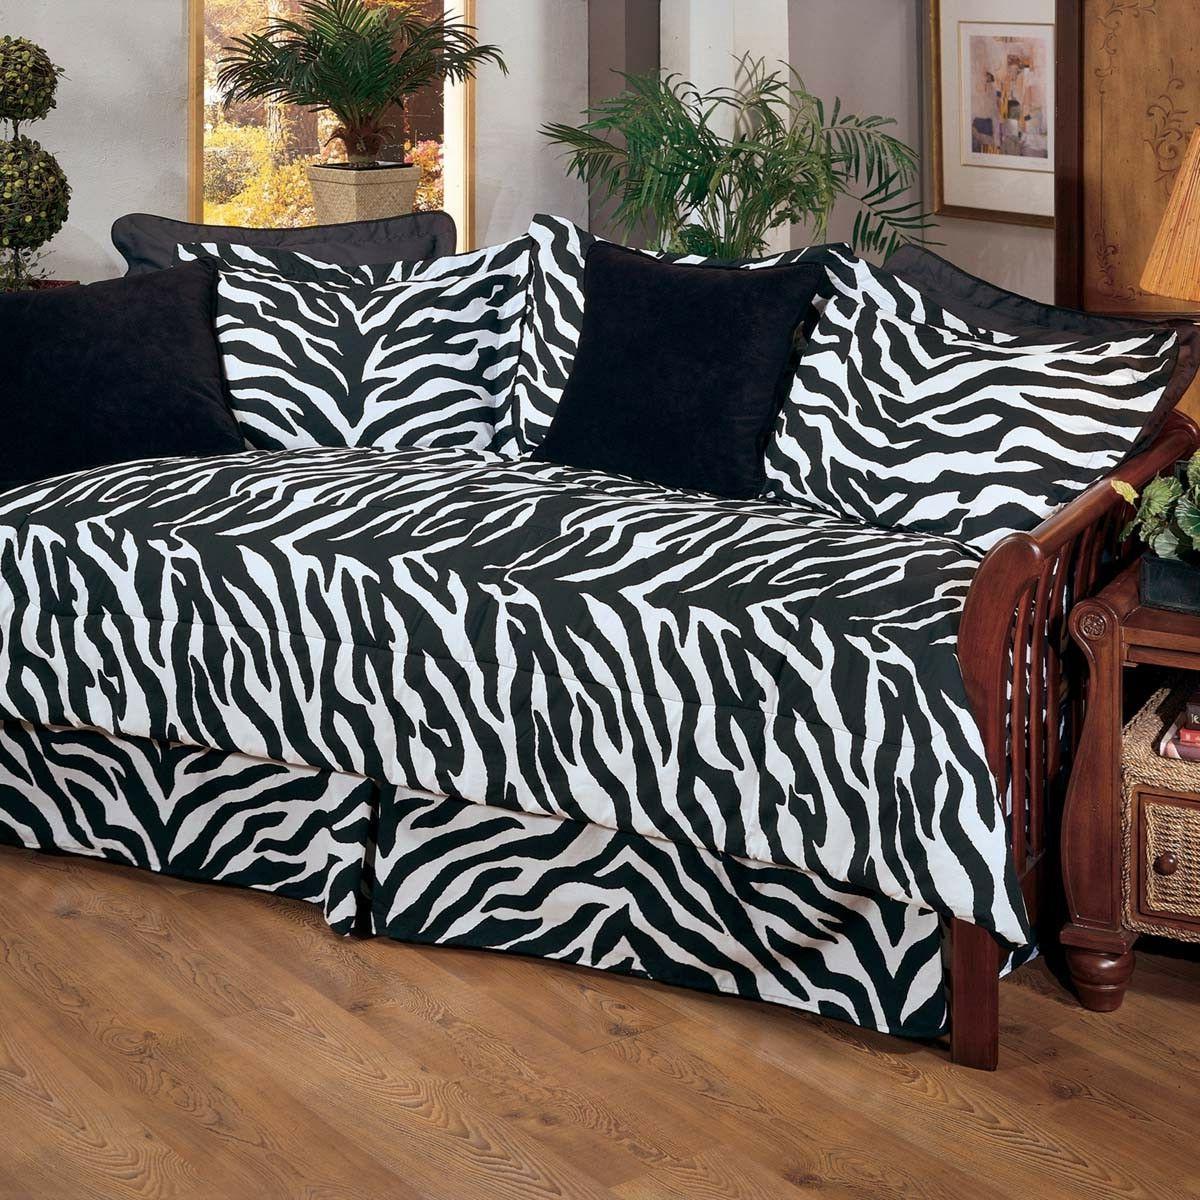 7pc Zebra Stripe Daybed Comforter Bedding Set Comforter Skir